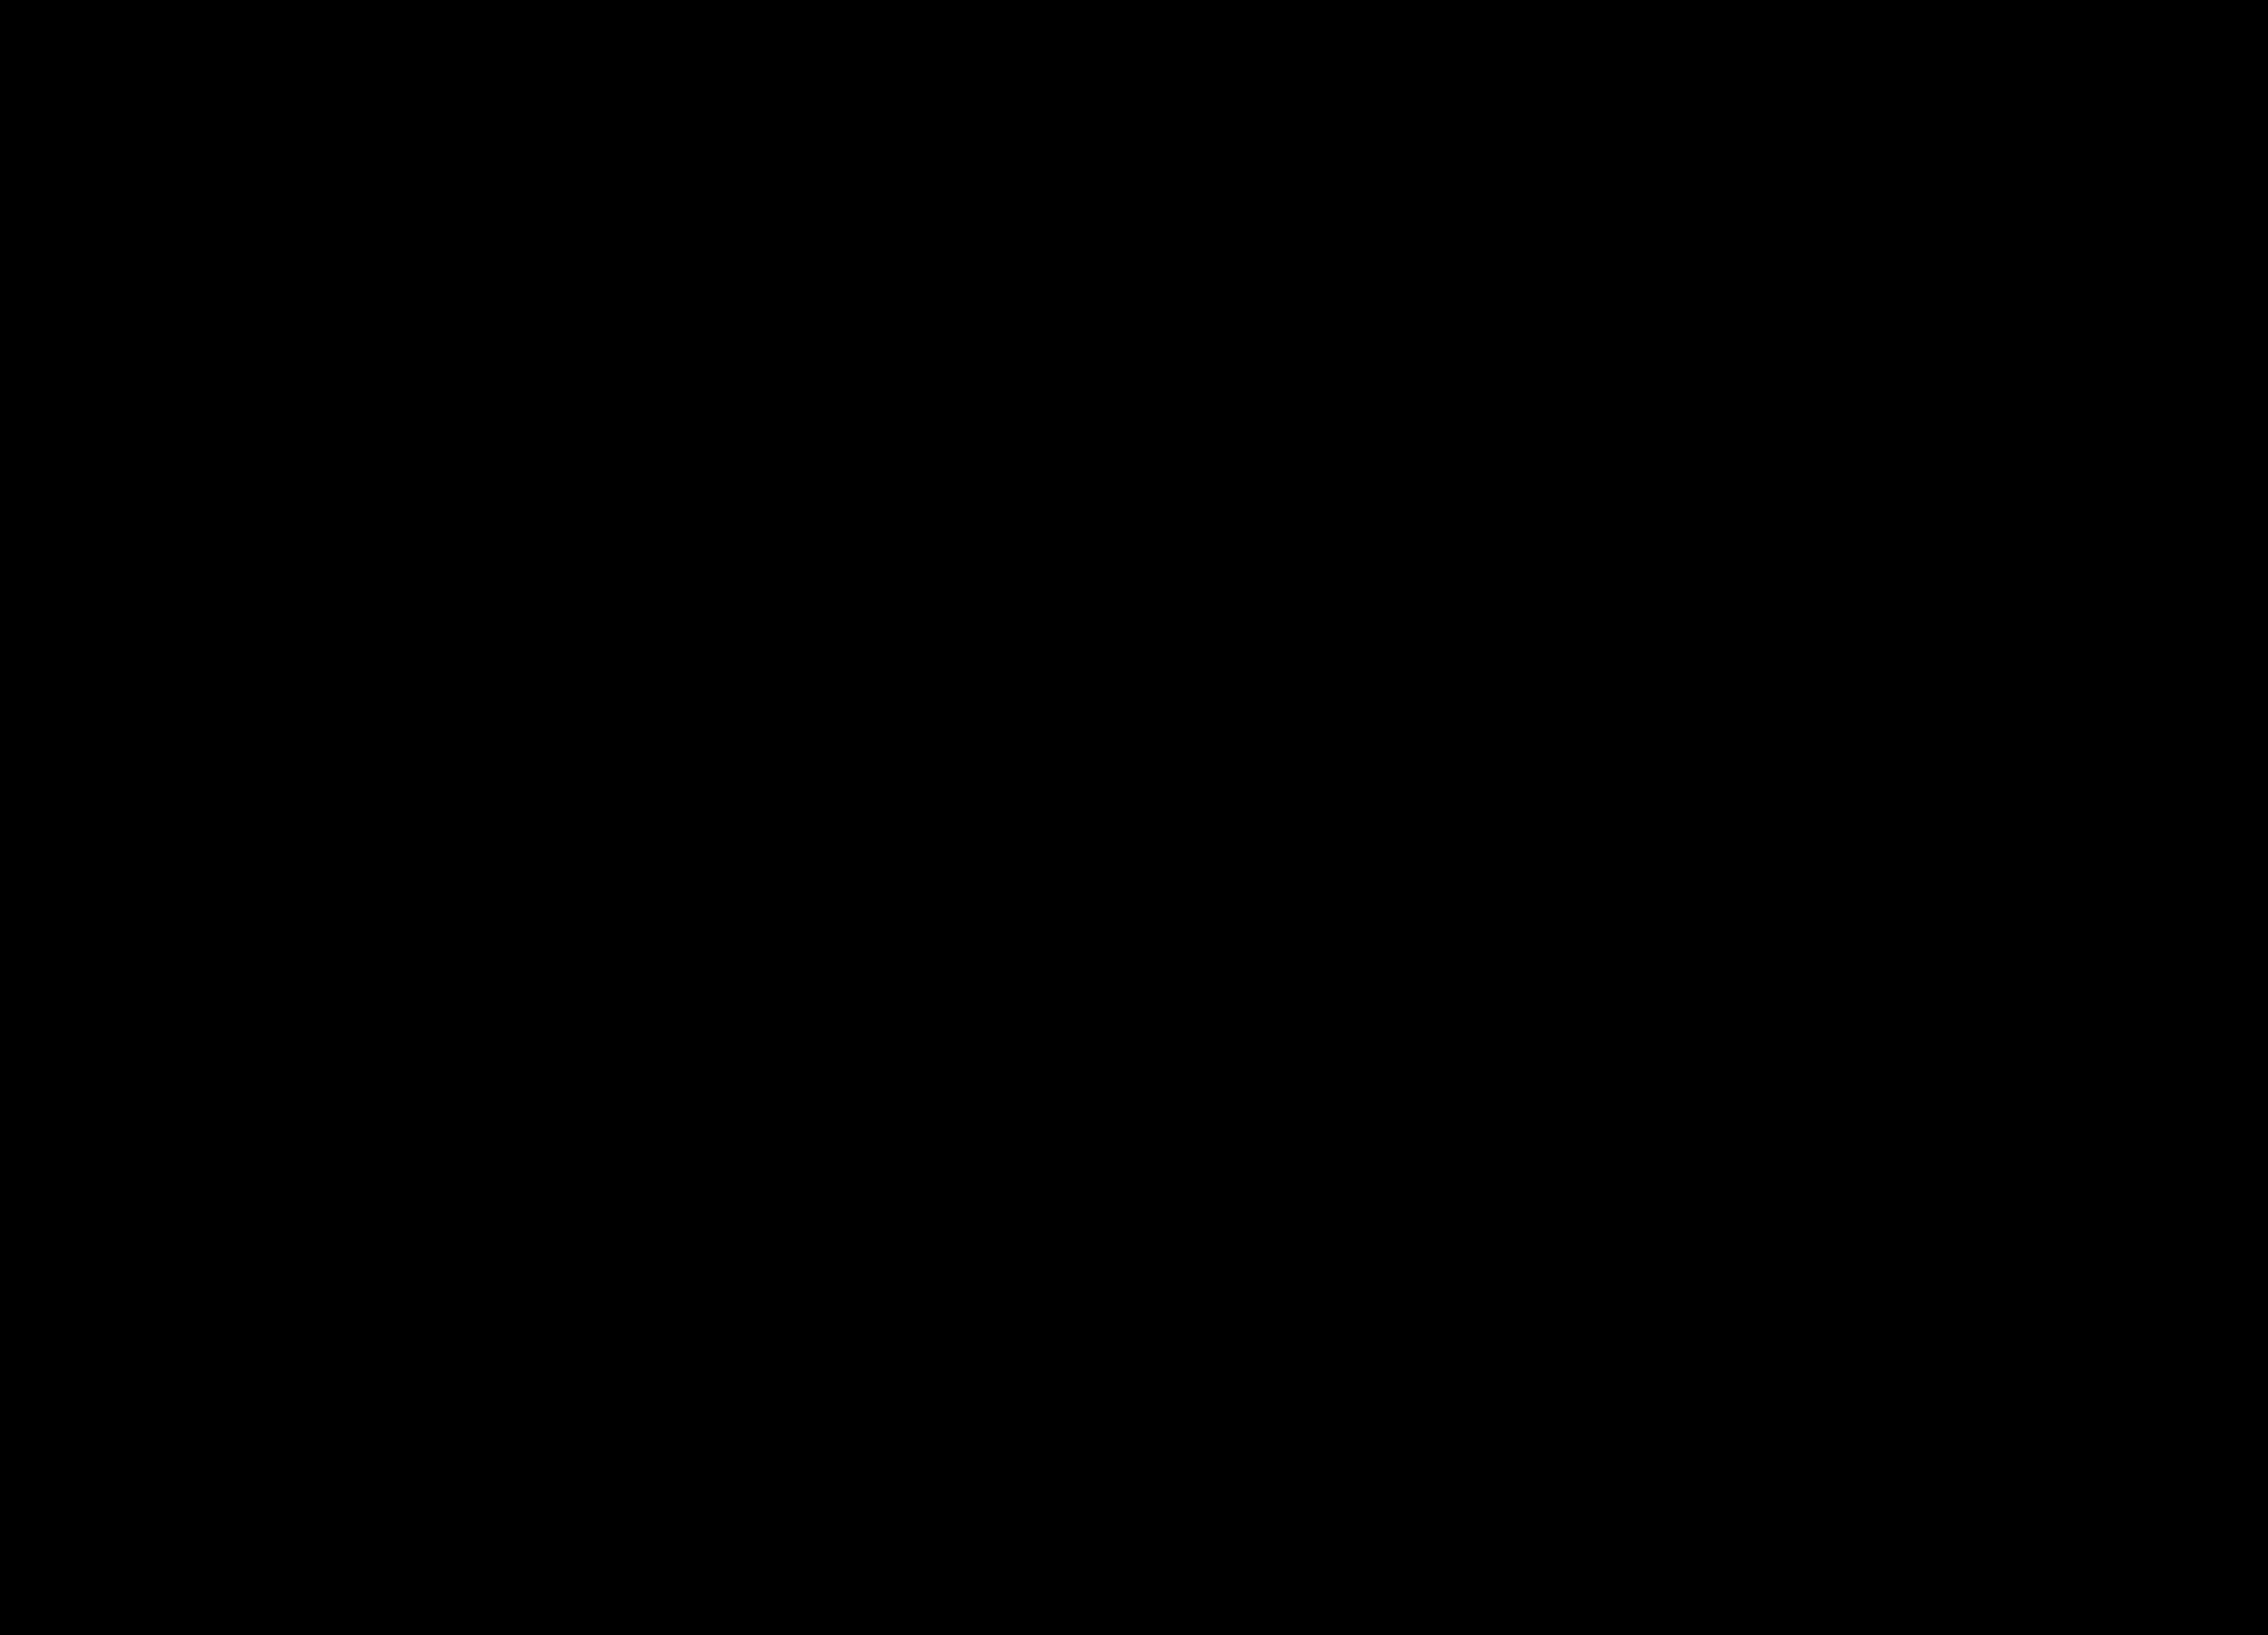 Crown clip art silhouette. Crowns at getdrawings com